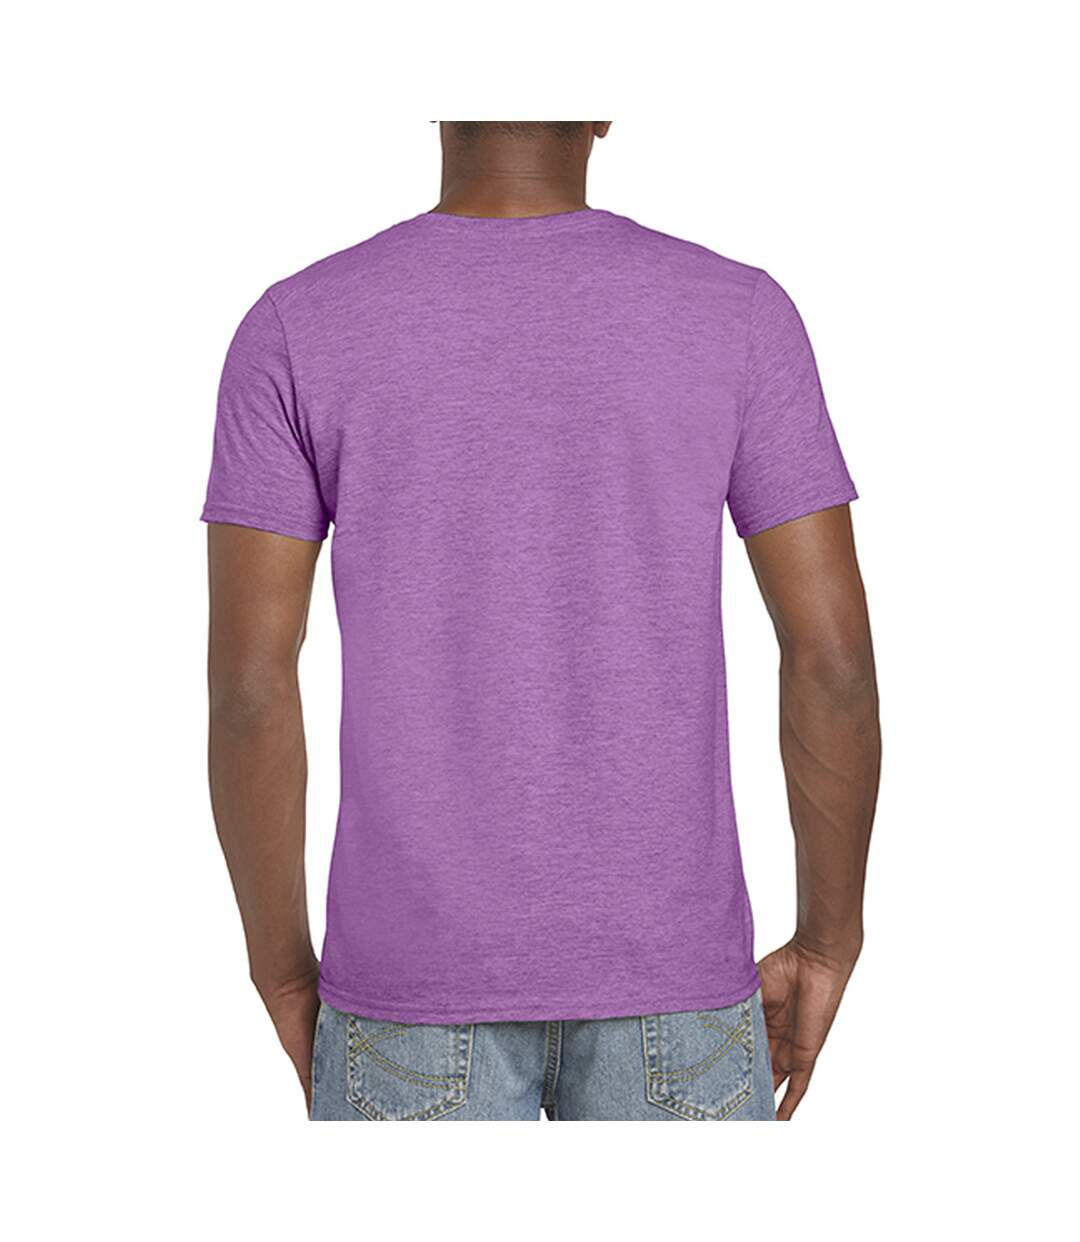 Gildan Mens Short Sleeve Soft-Style T-Shirt (Graphite Heather) - UTBC484